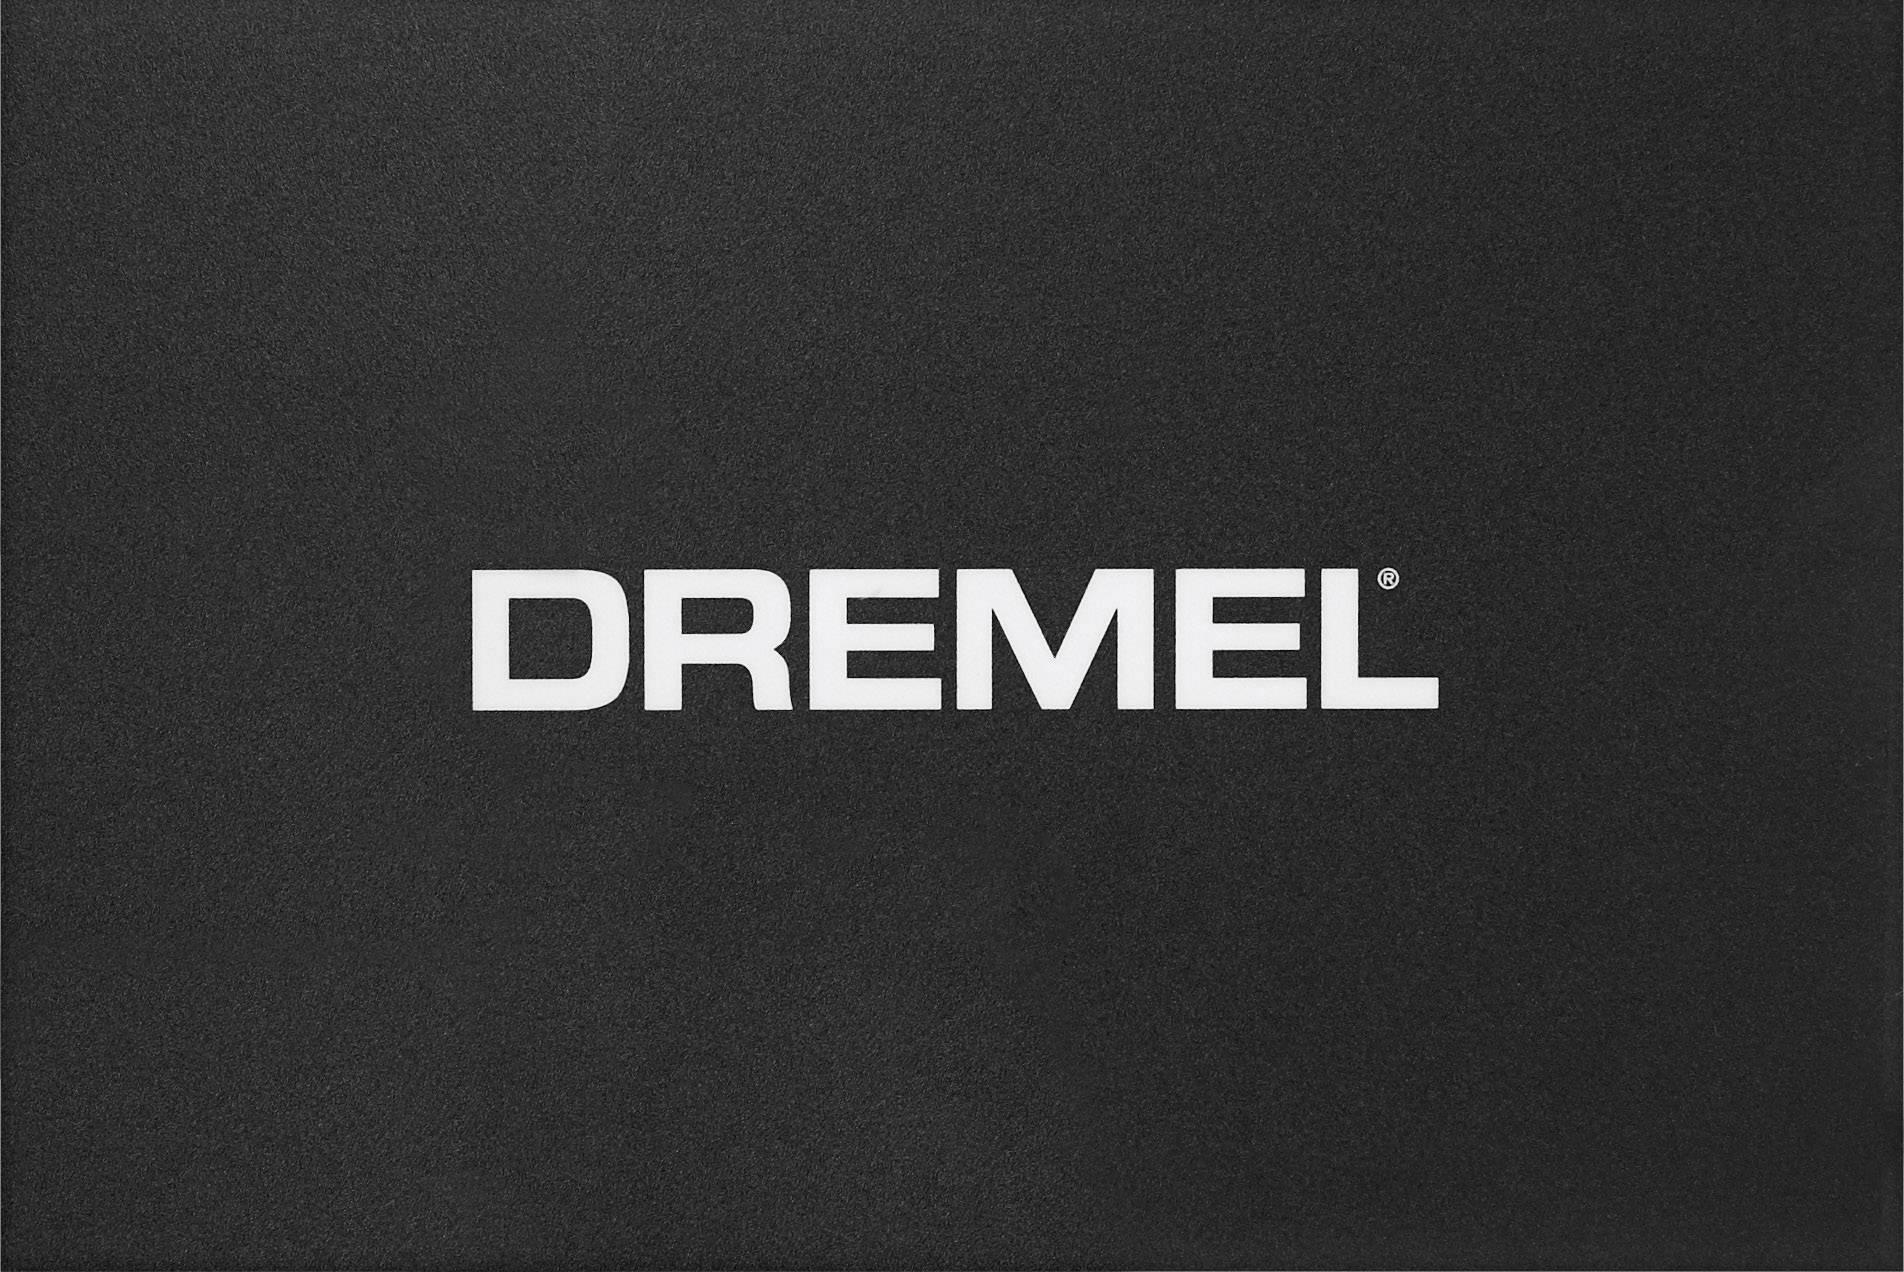 Tisková podložka (3D40) 2615BT02JA, sada 2 ks Vhodné pro 3D tiskárnu Dremel 3D Idea Builder 3D40